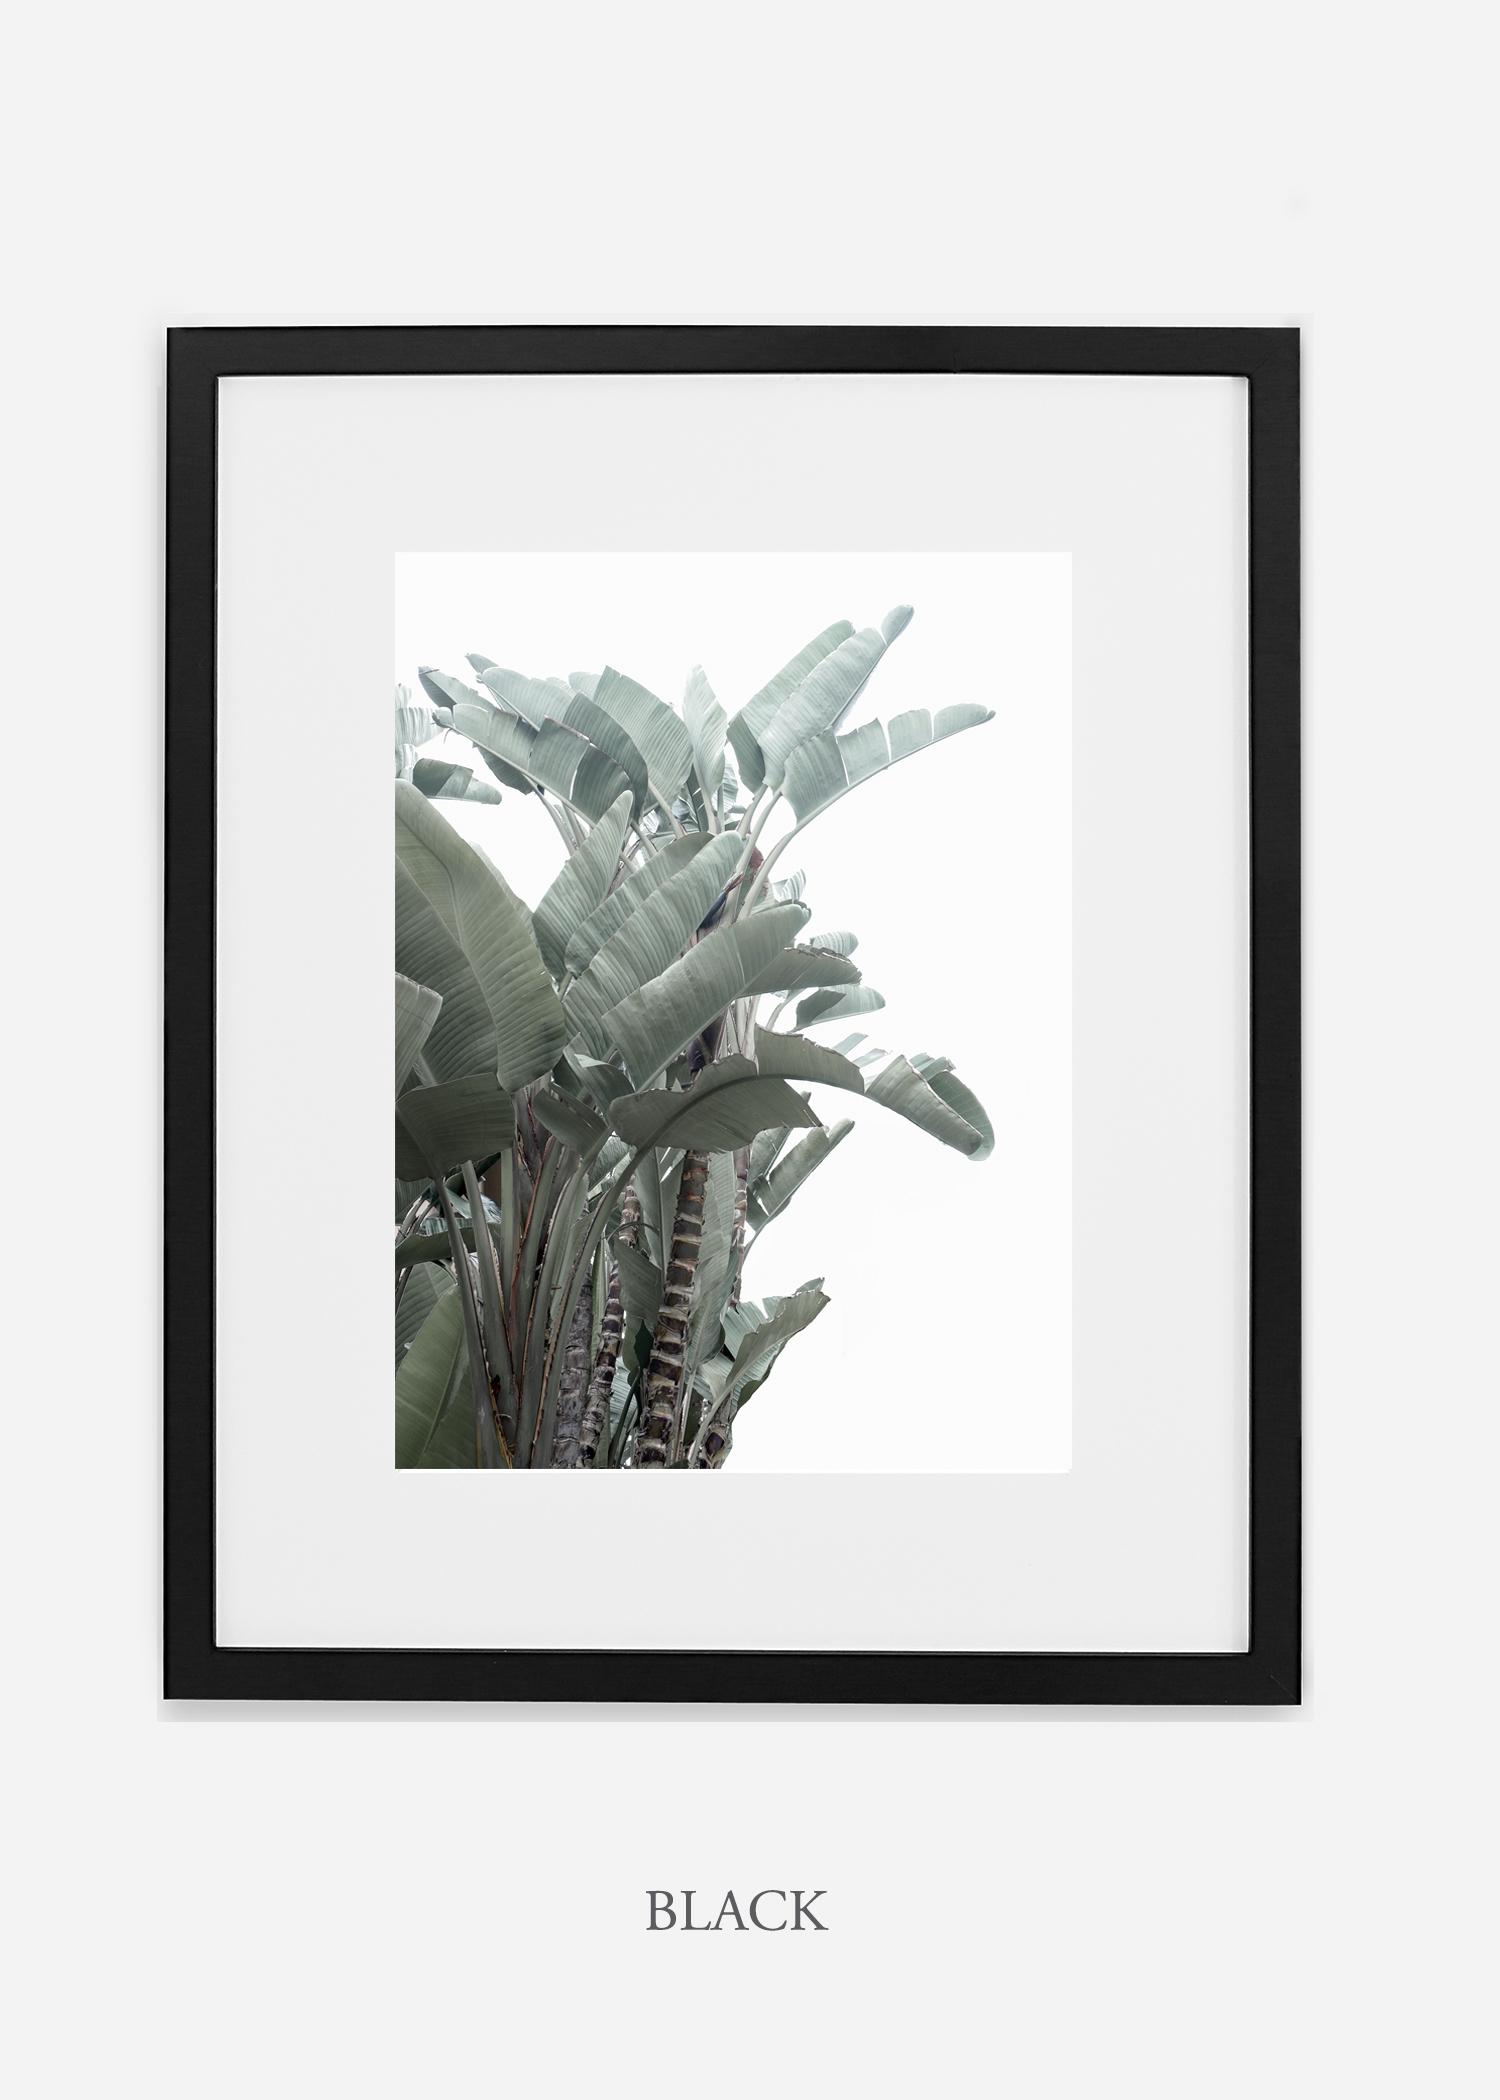 wildercalifornia_blackframe_WinterWhite_BananaLeafNo.1_Tropical_LosAngeles_Art_HomeDecor_interiordesign_design.jpg